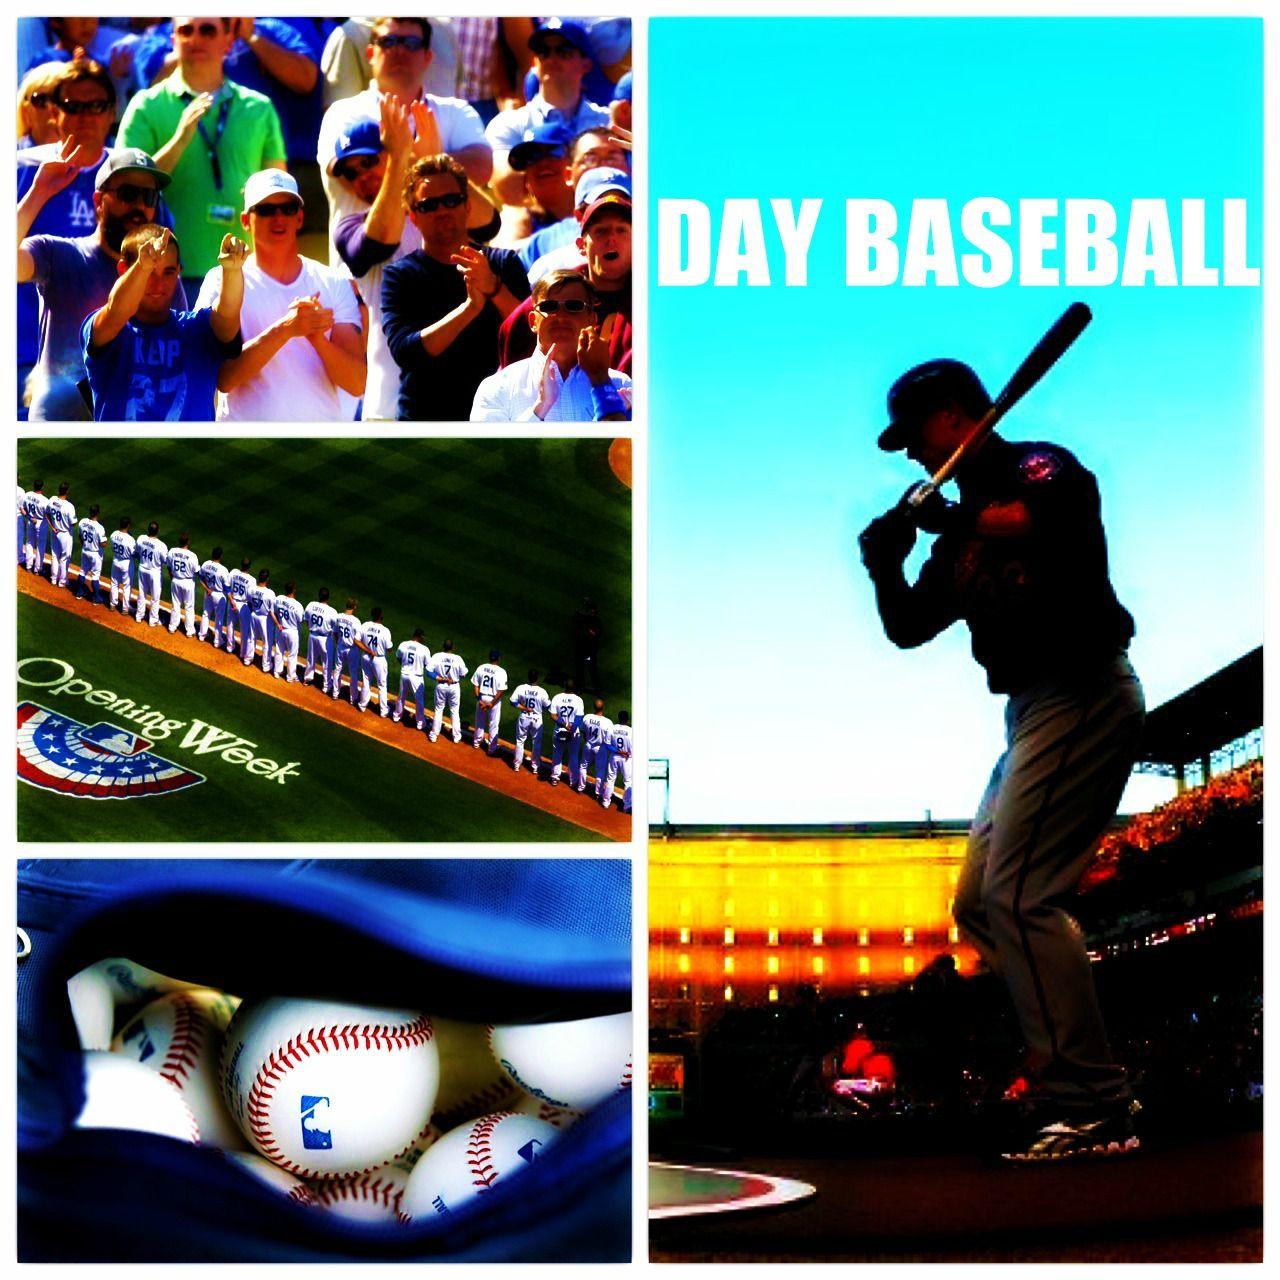 There S Nothing Like Day Baseball But I Can T Do It Everyday Baseball Baseball Tournament Ucla Basketball